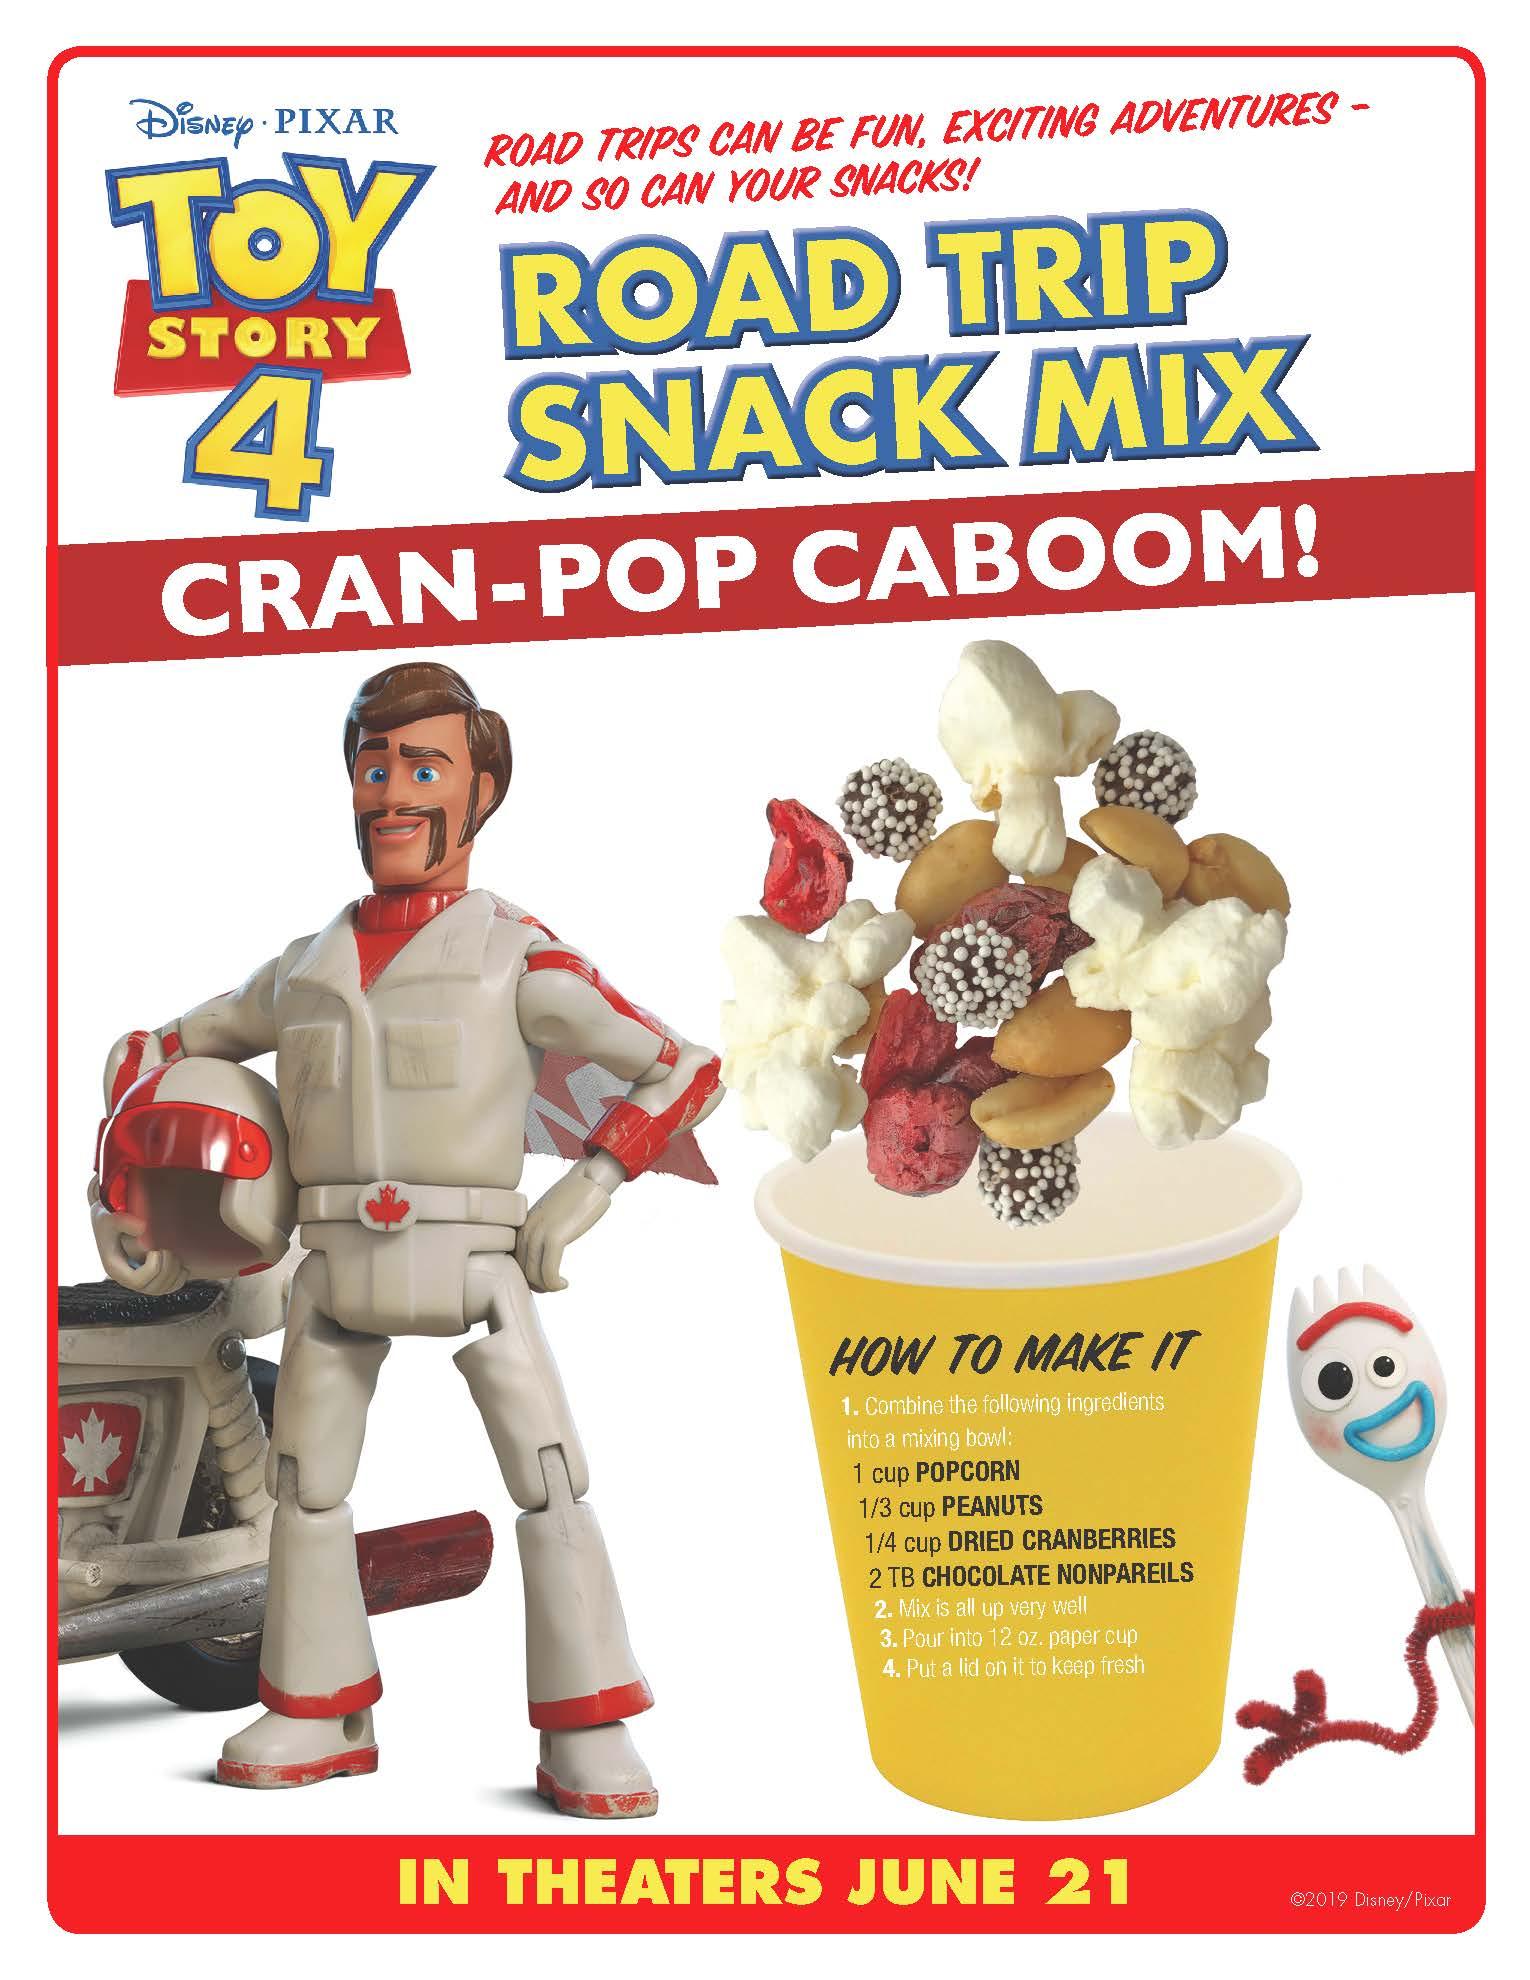 Toy Story Party Duke Caboom Snack Mix Recipe #toystory #toystory4 #dukecaboom #keanureeves #toystoryparty #snackmix #toystoryrecipe